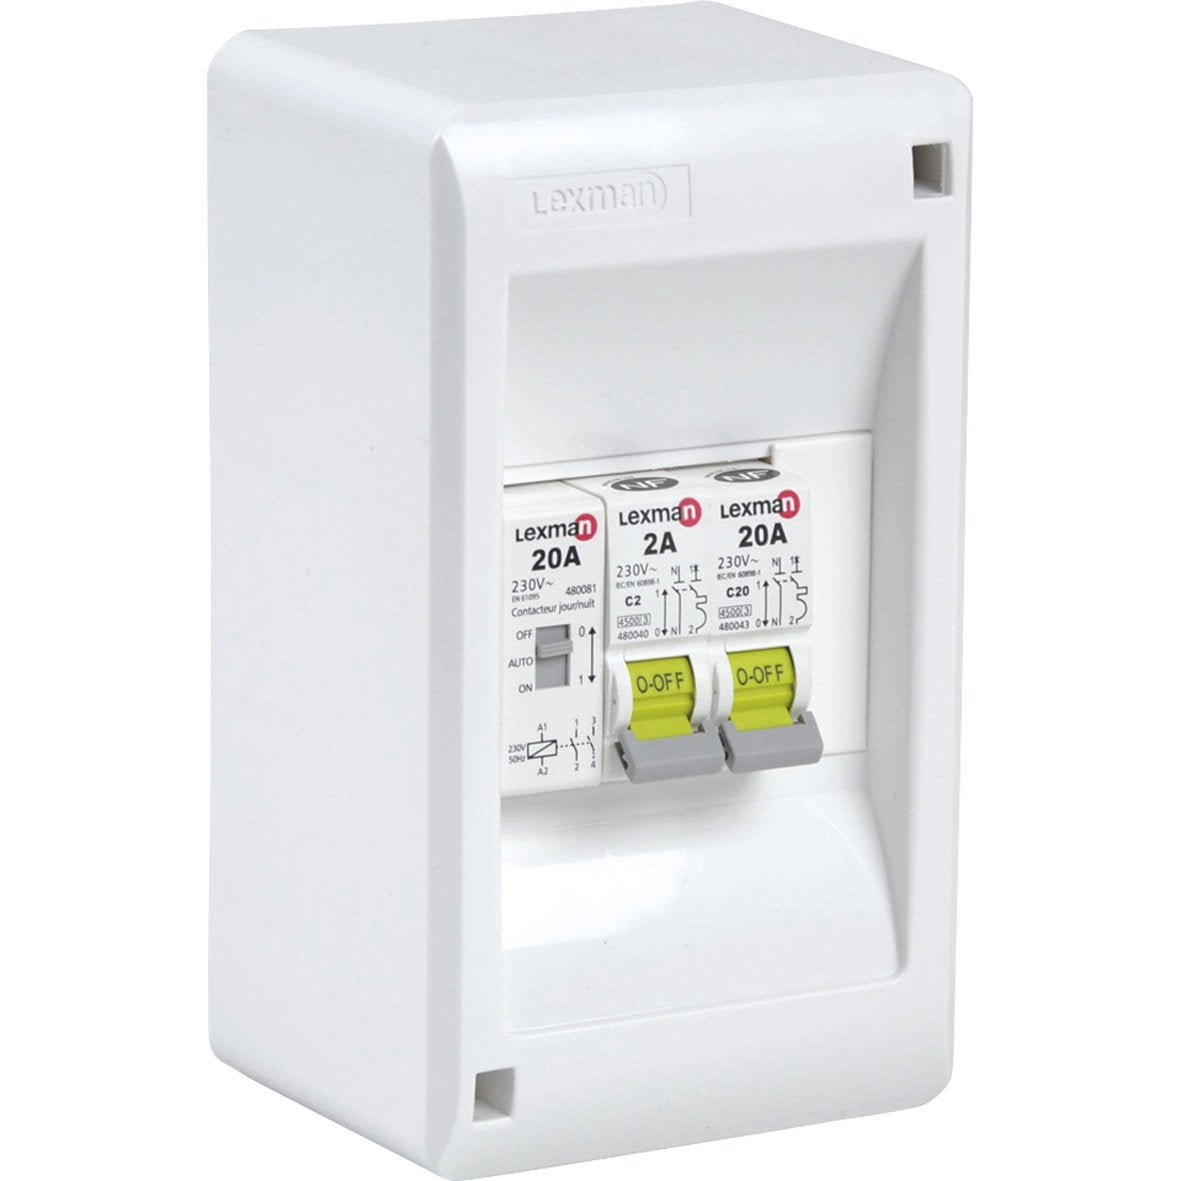 Tableau chauffe eau pr c bl lexman 1 rang e 4 modules - Tableau magnetique leroy merlin ...